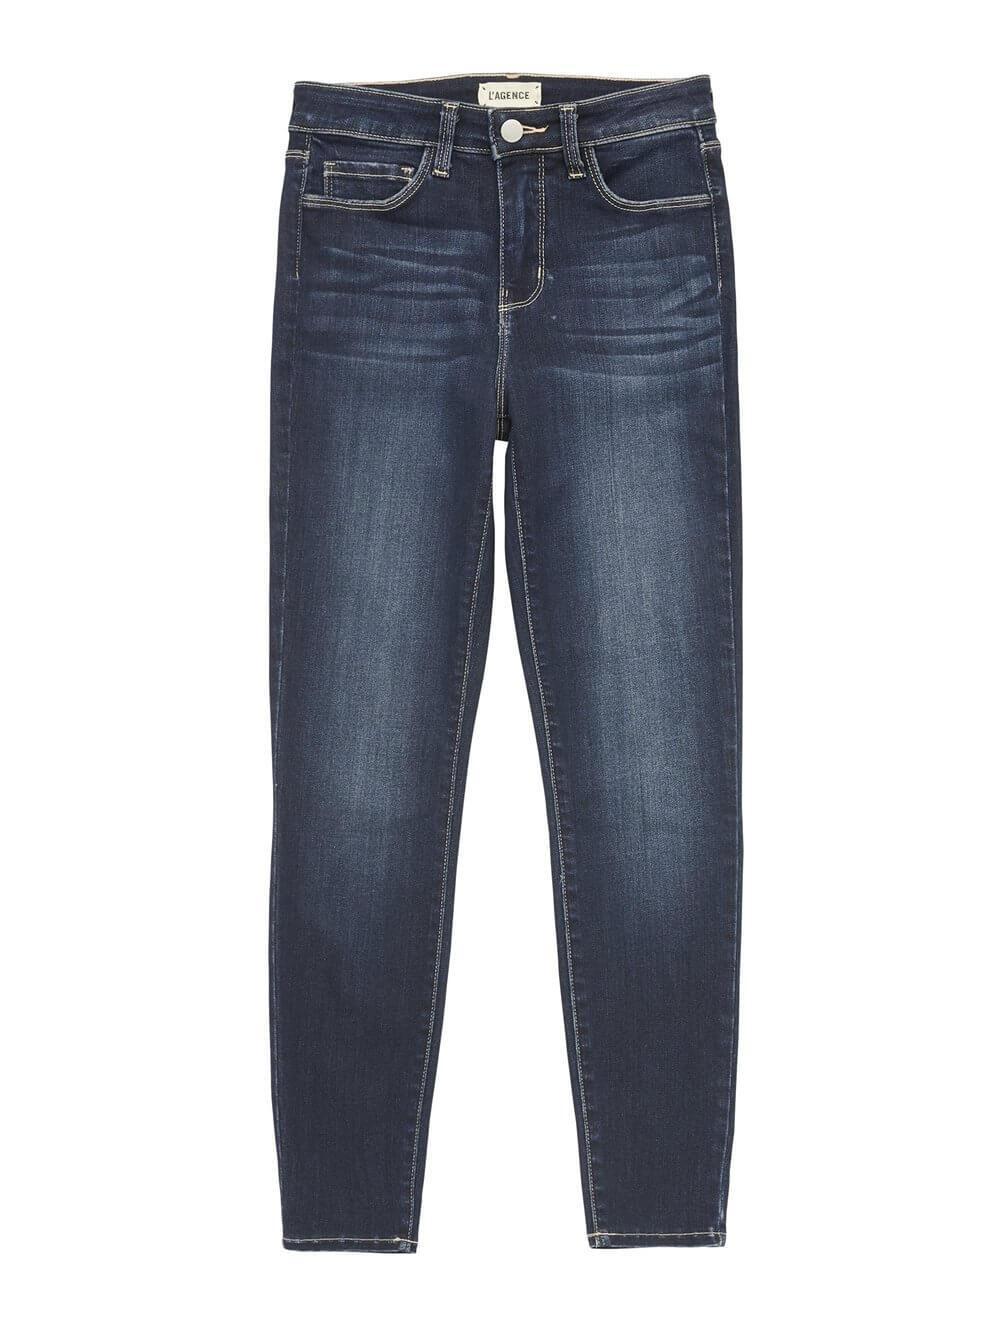 Margot Crop Skinny Jean Item # 2294DXL